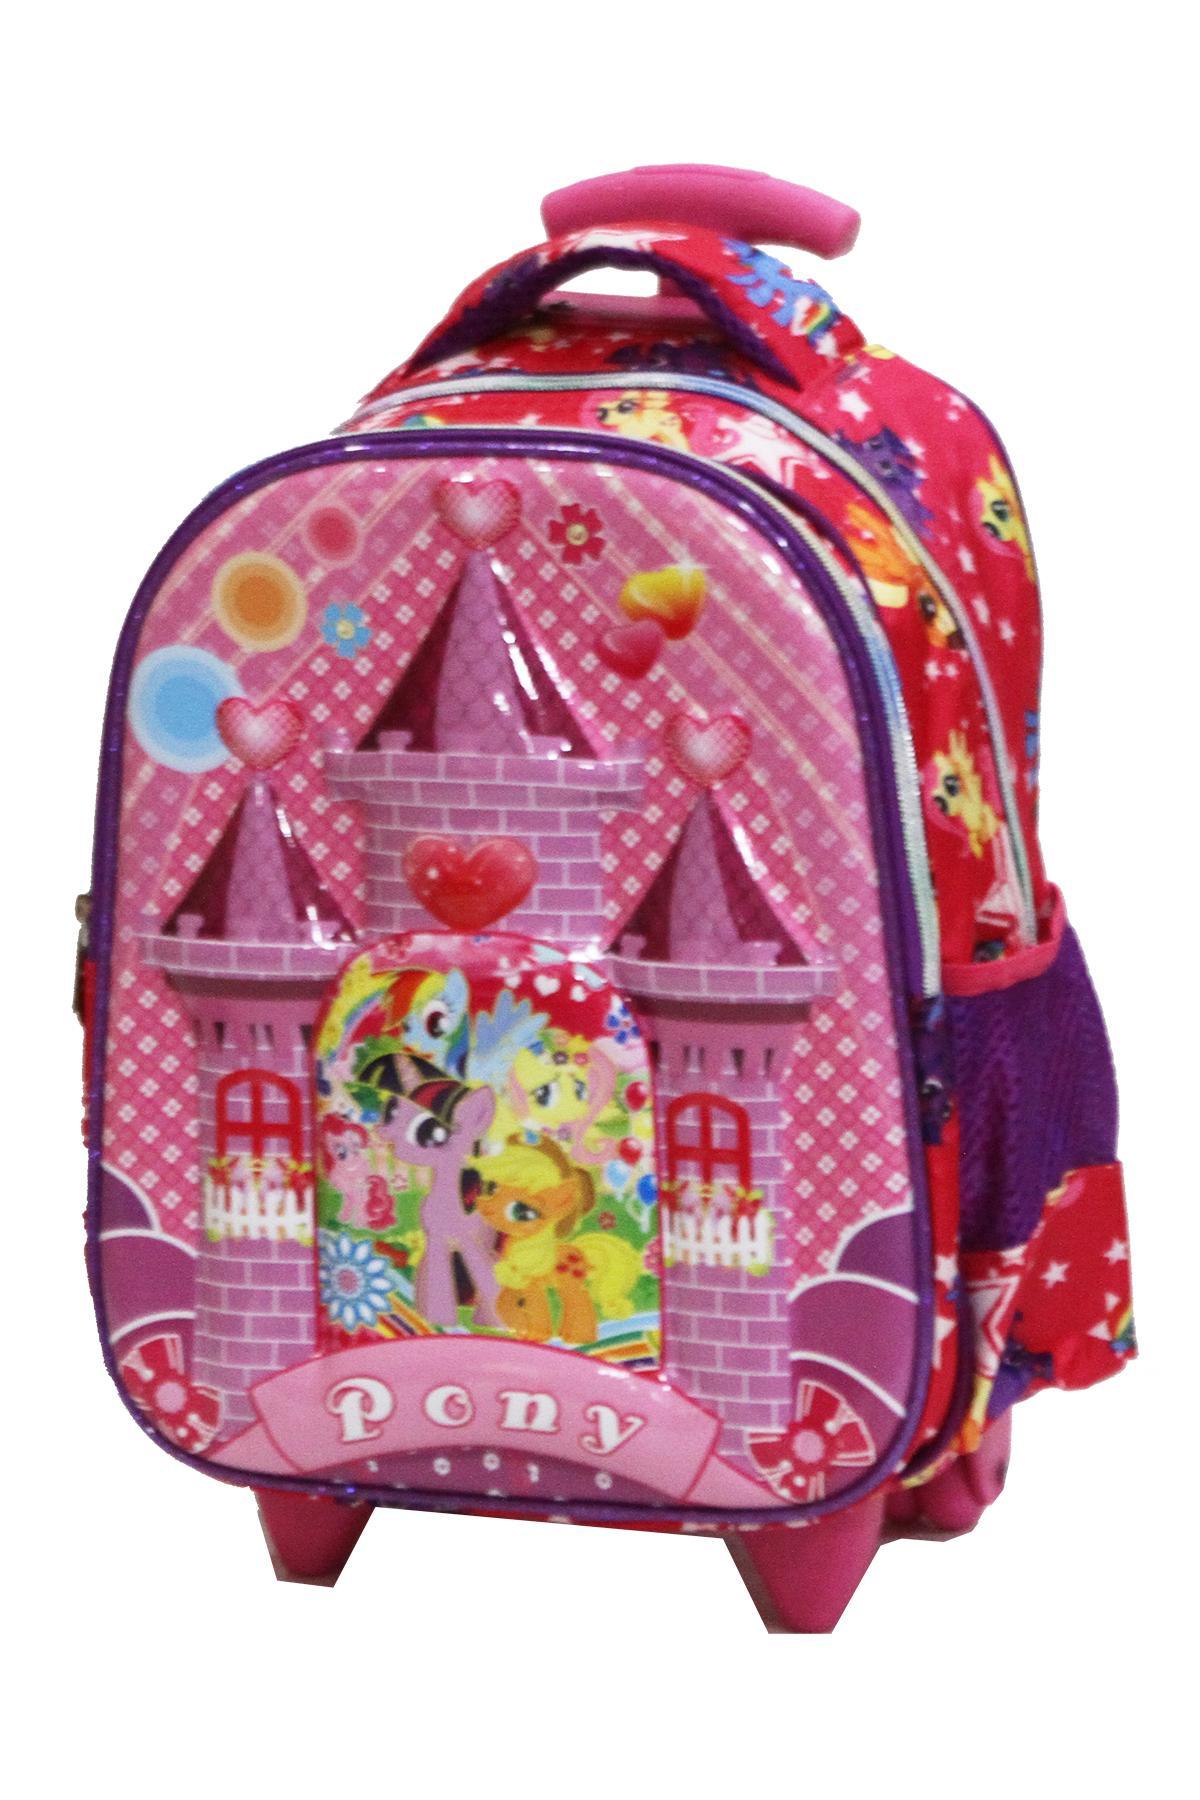 ... Onlan My Little Pony Istana 6D Timbul Tas Trolley Anak TK & Play Group Import -